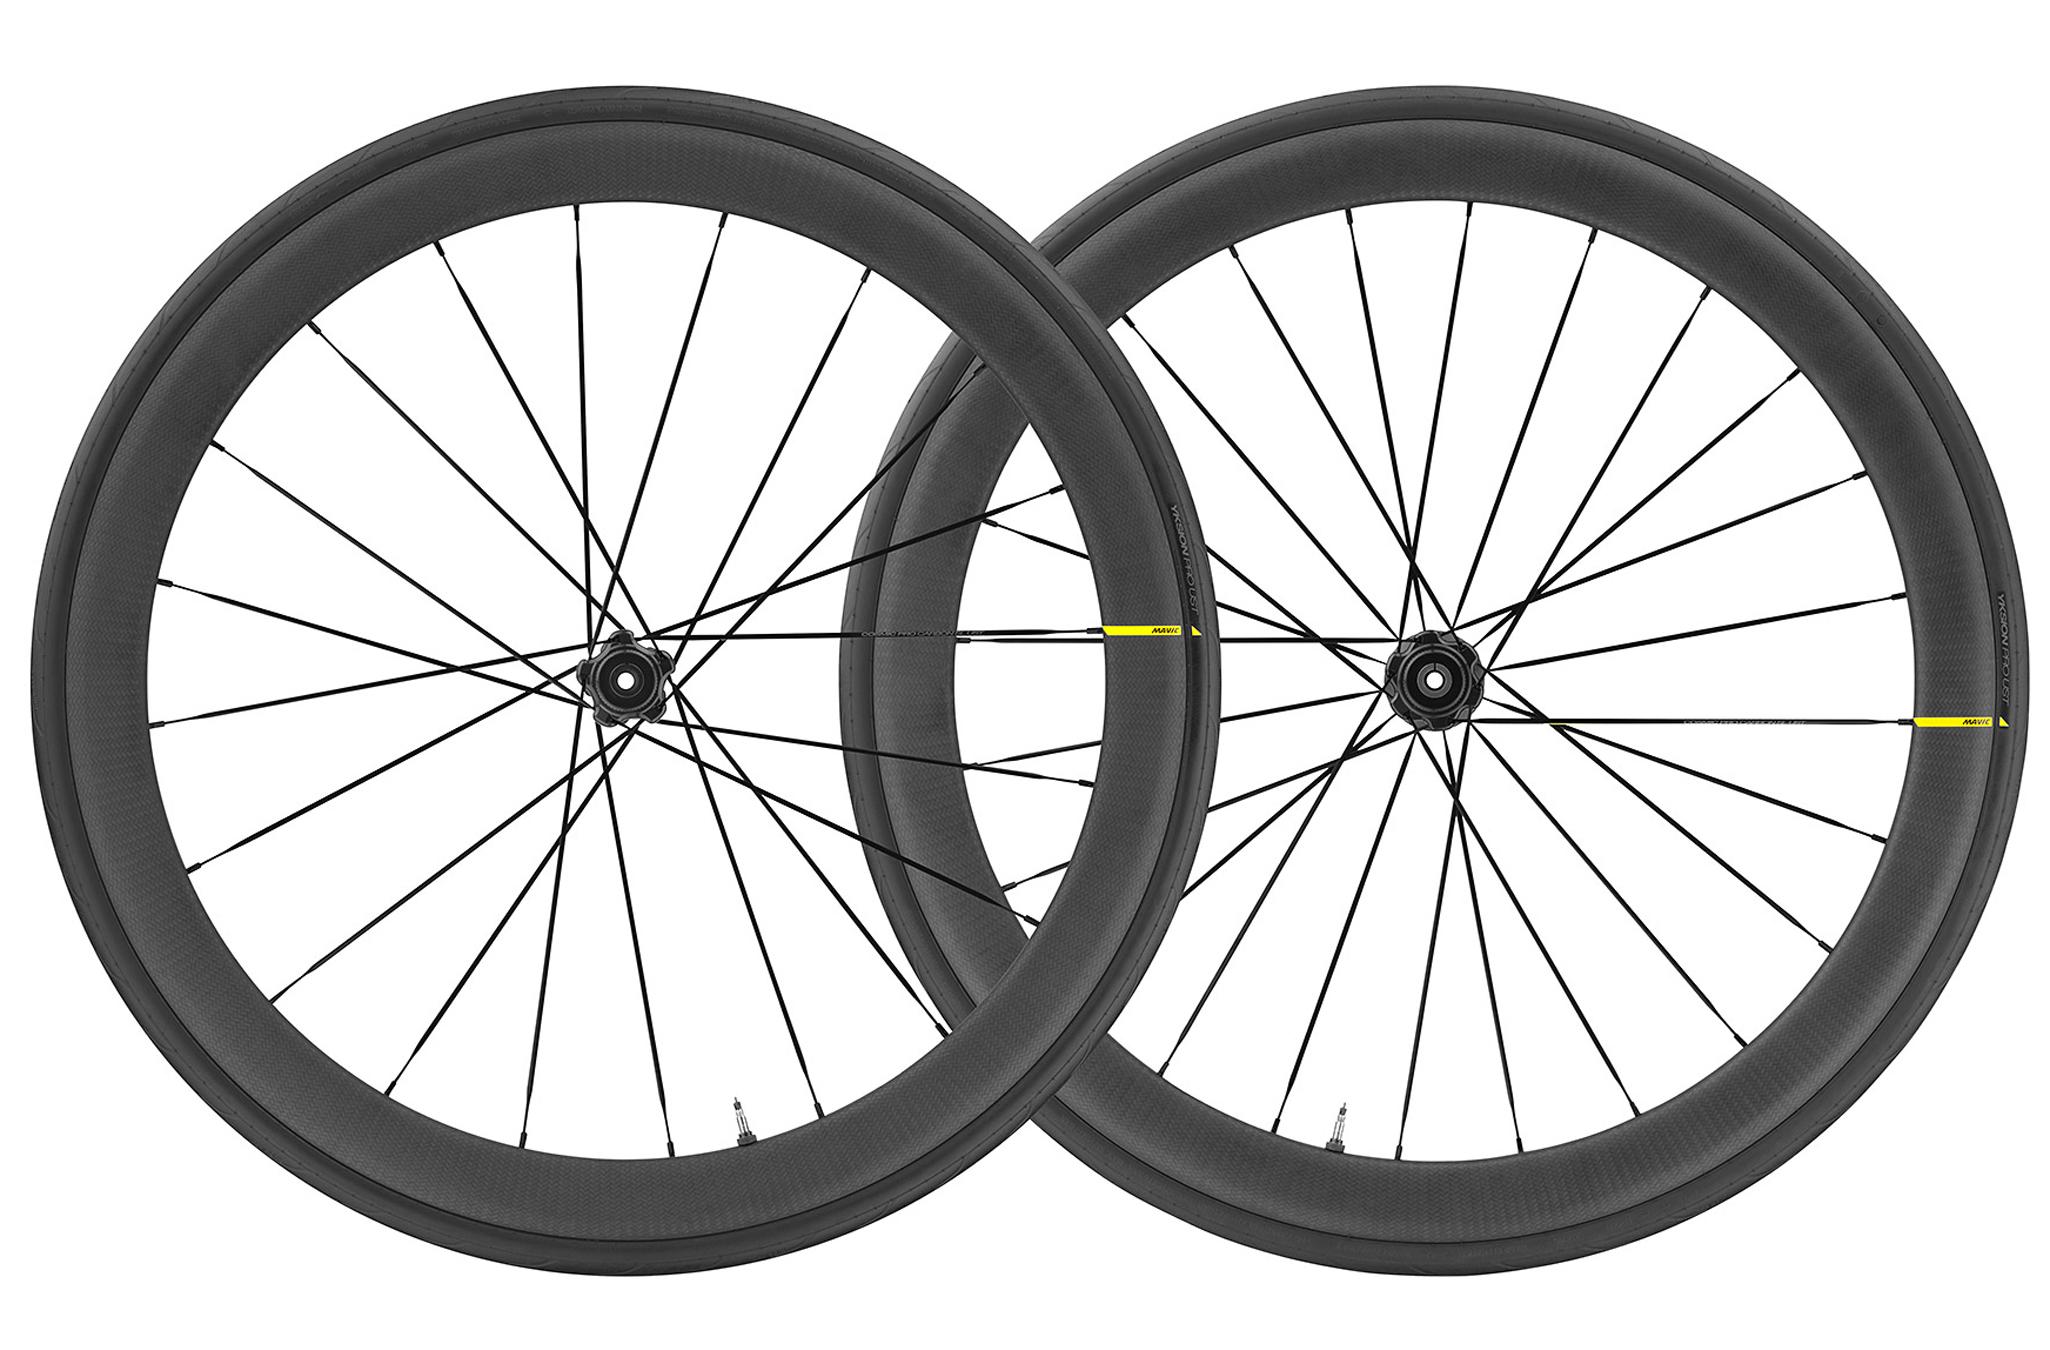 Mavic Cosmic Pro Carbon UST Tubeless Disc Brake 700c Road Wheelset (Black)